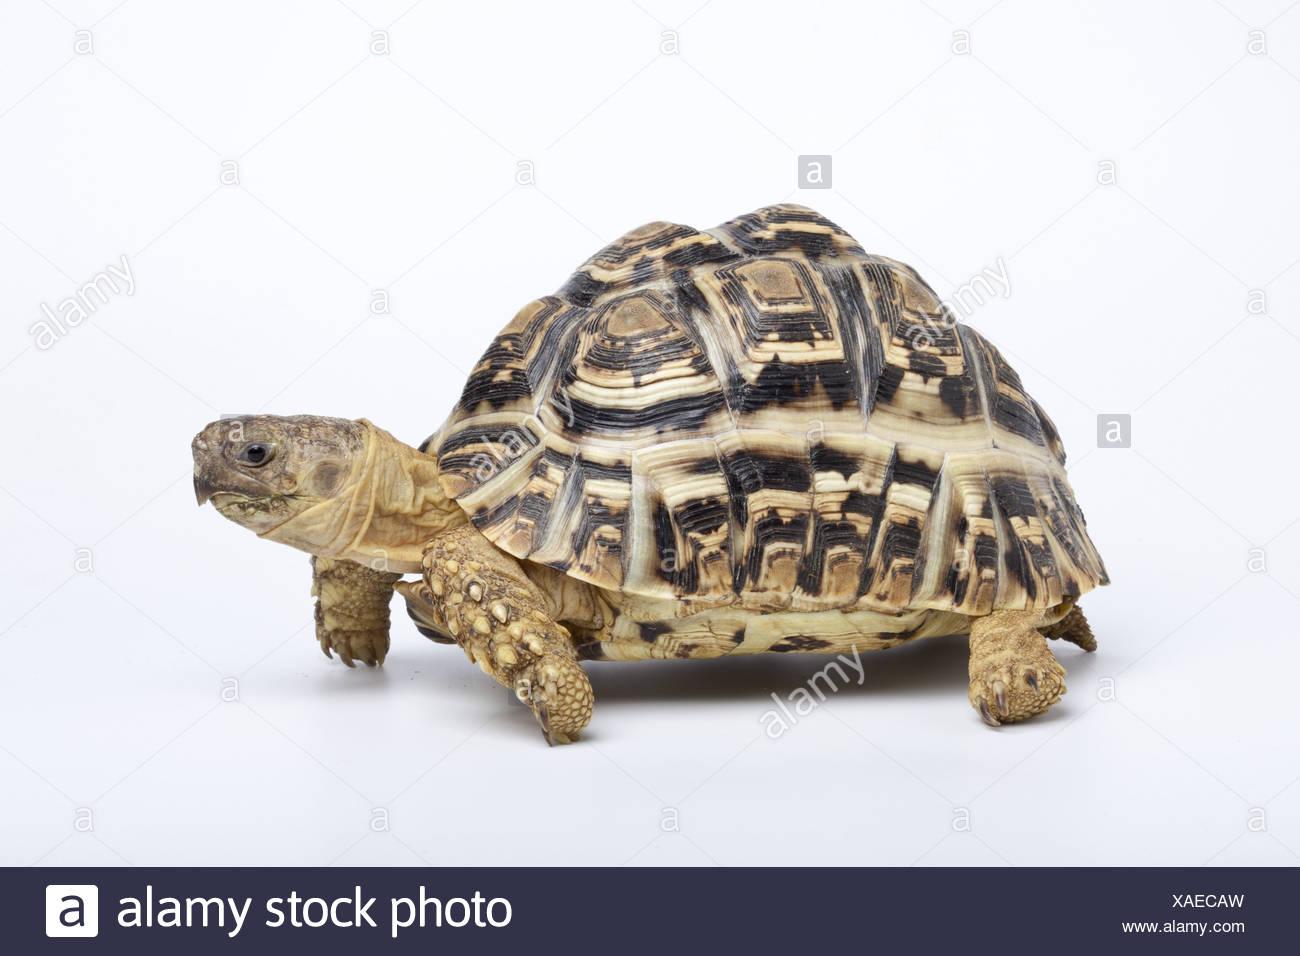 Leopard Tortoise (Stigmochelys pardalis) adult - Stock Image